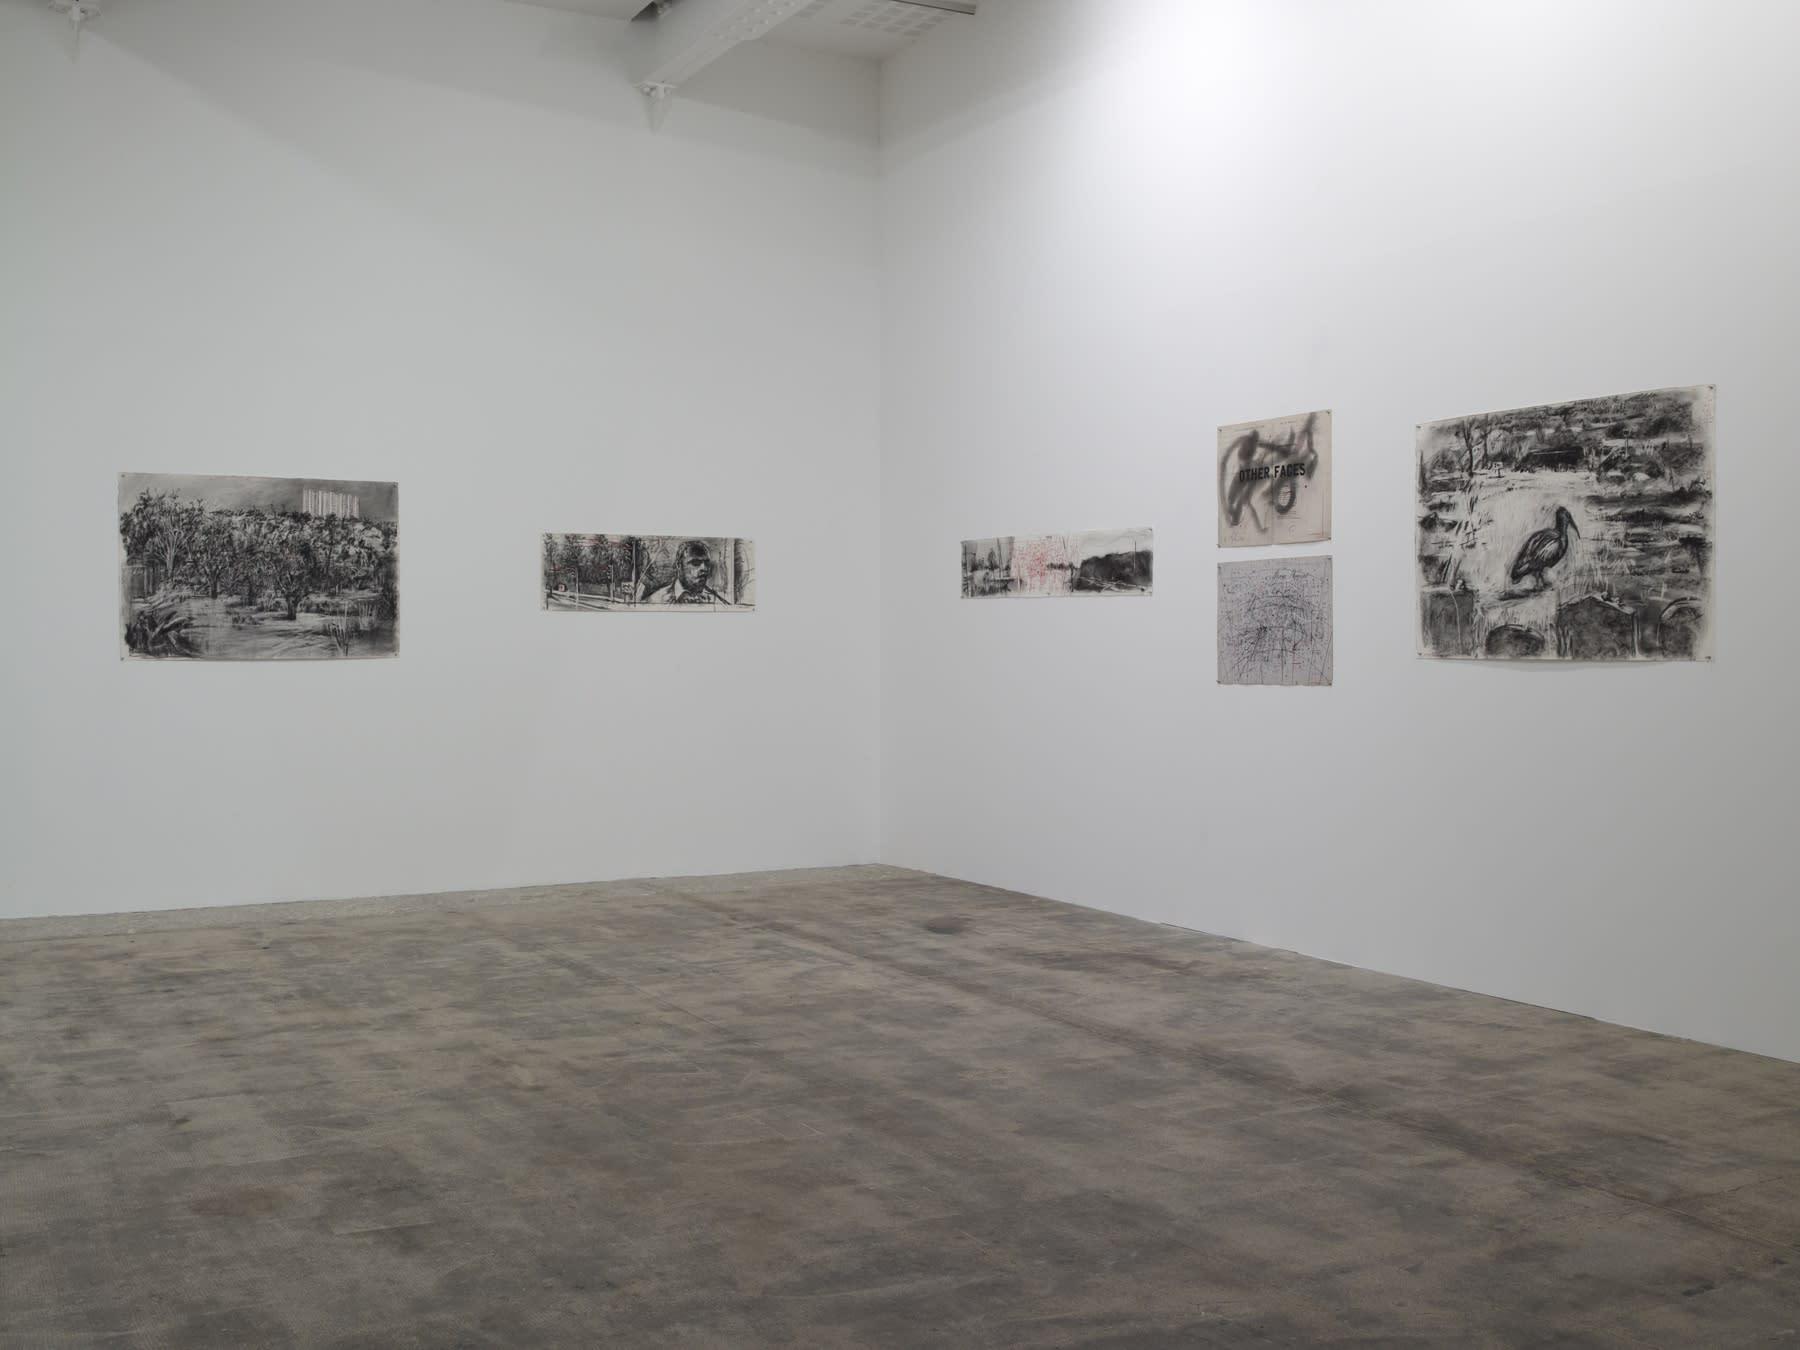 Tacita Dean, William Kentridge, Gabriel Orozco, Giuseppe Penone, Niele Toroni, Lawrence Weiner